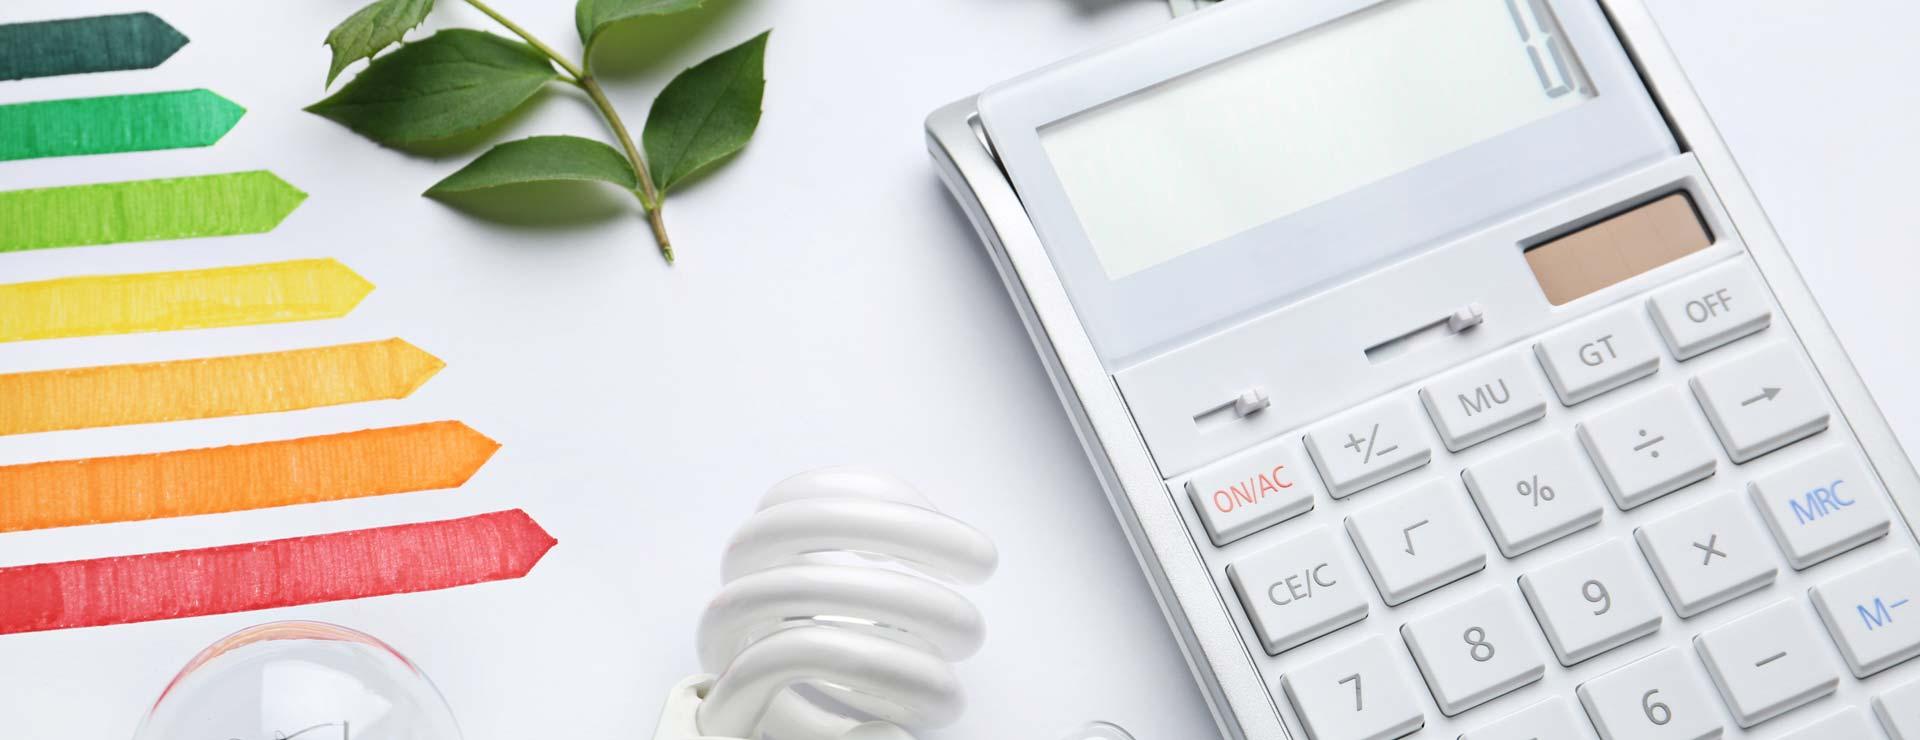 light bulb and calculator